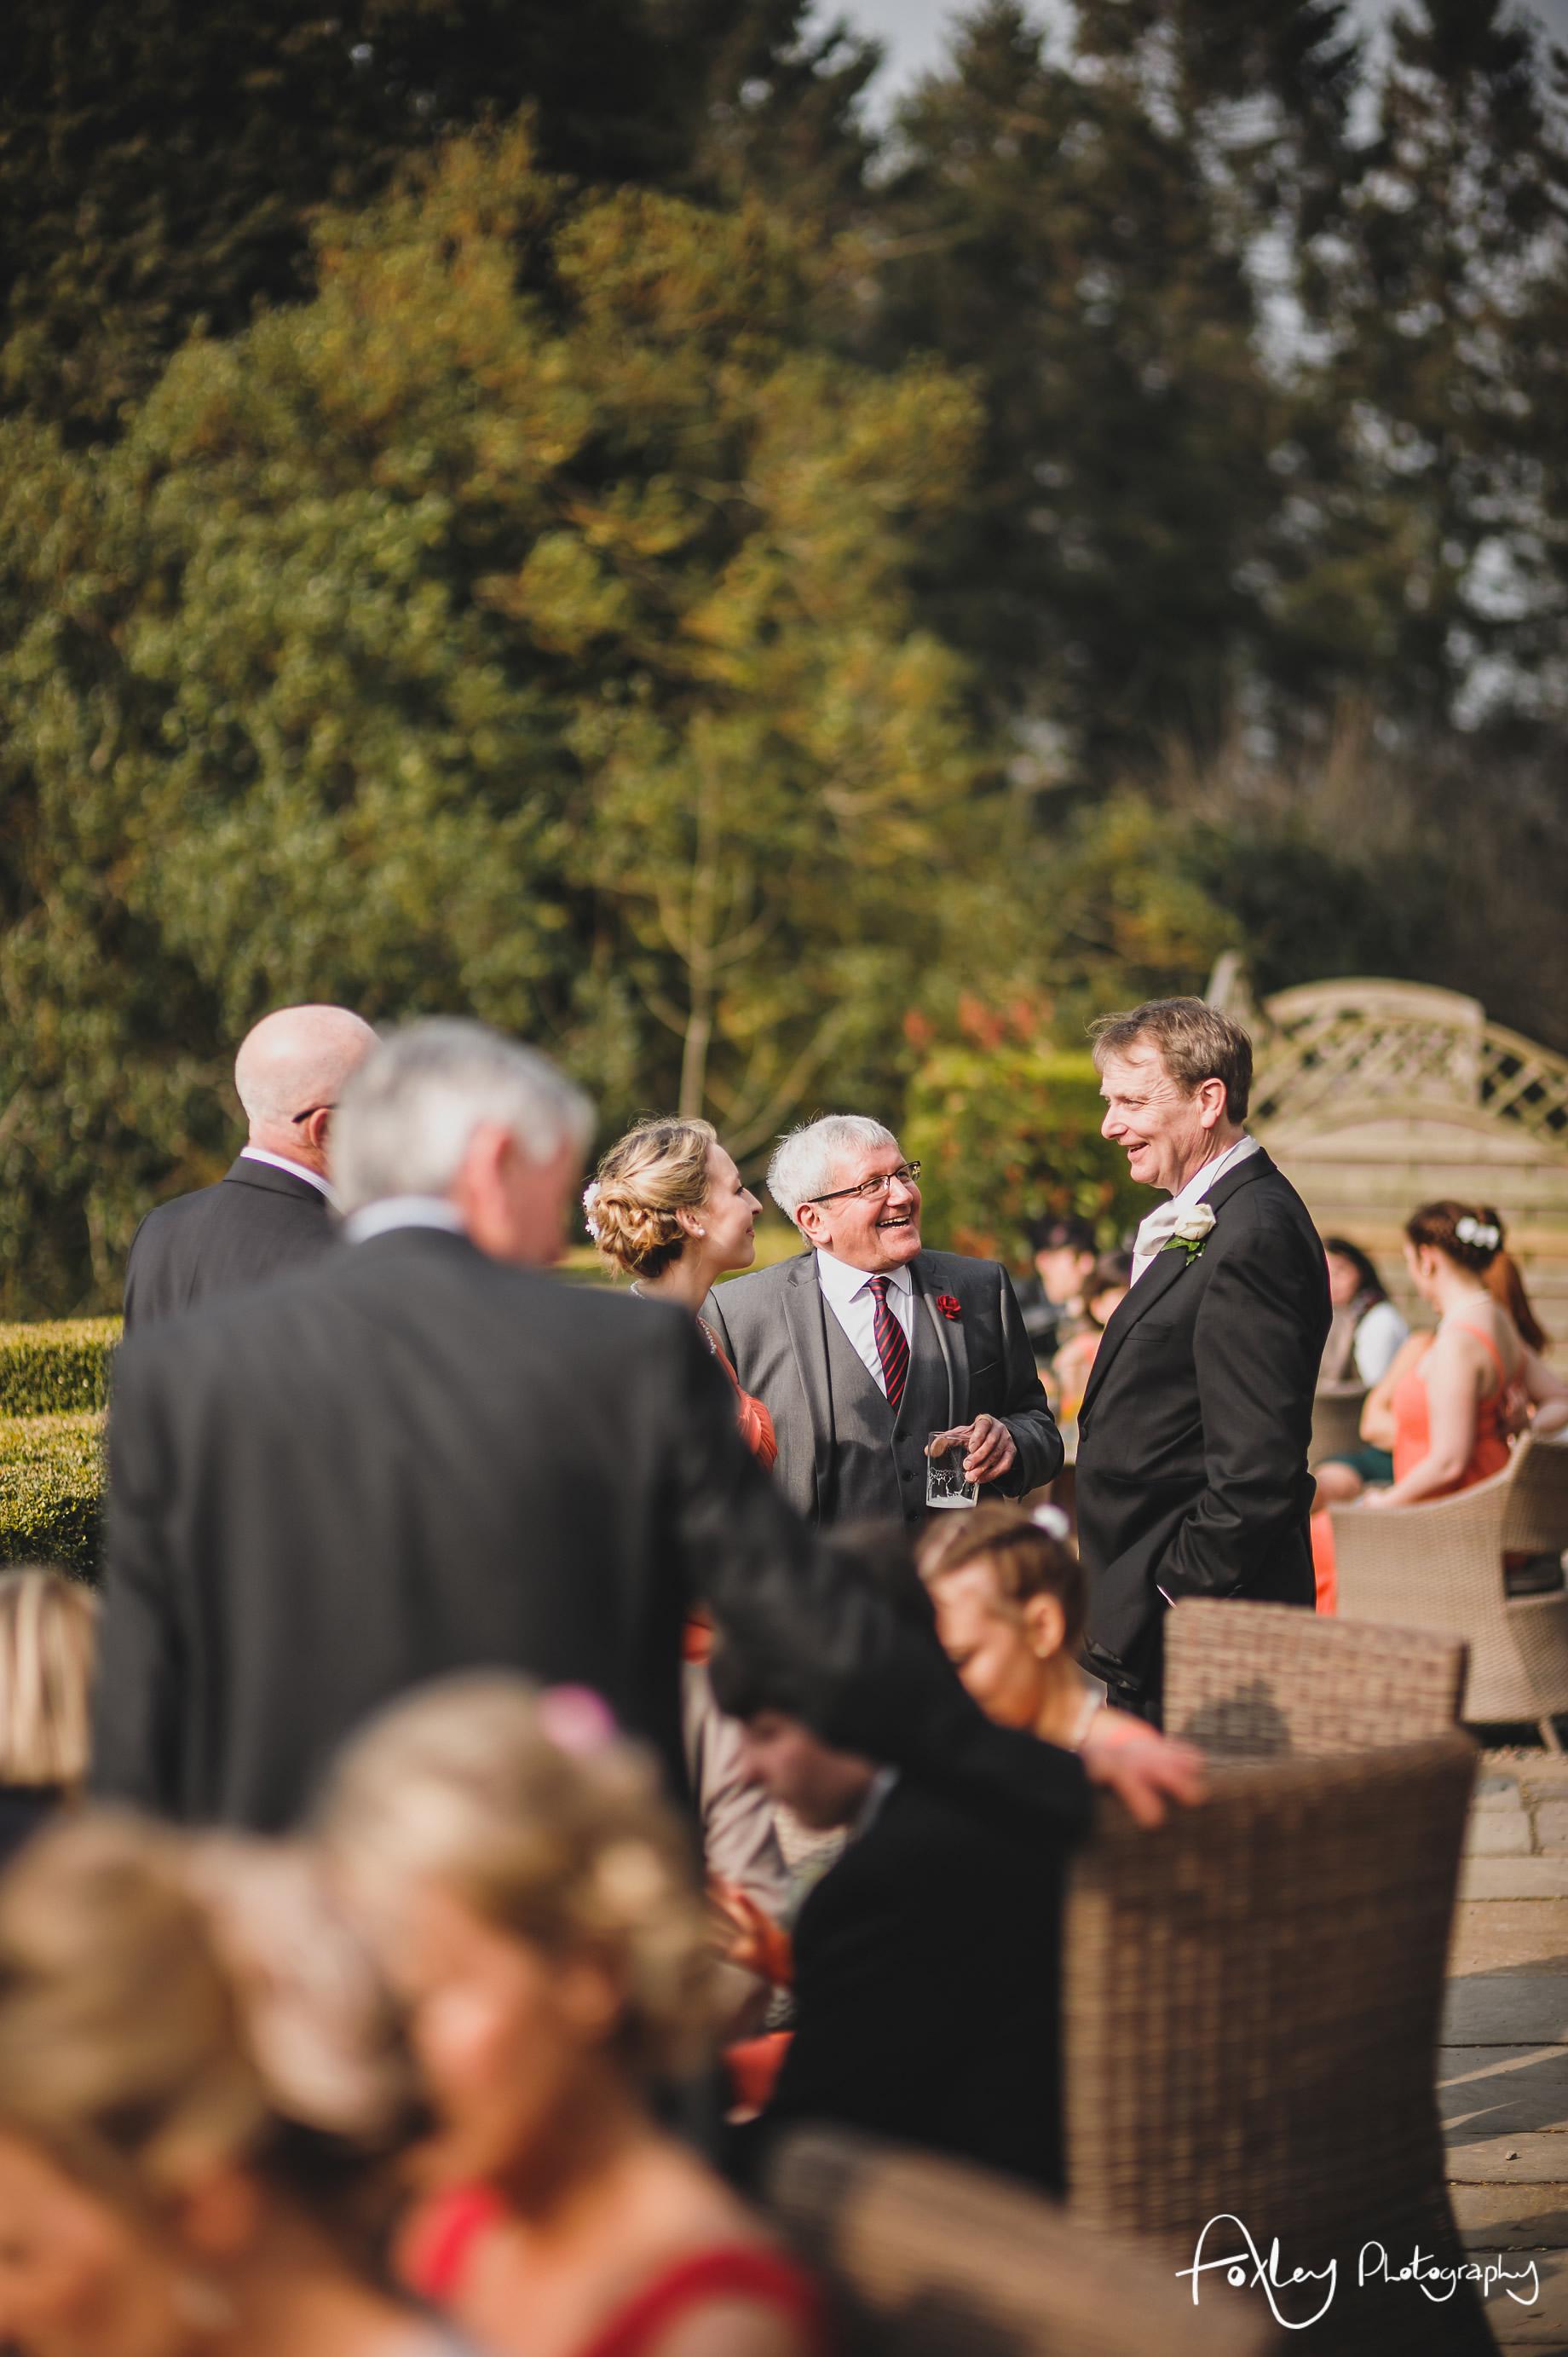 Gemma and Lewis' Wedding at Mitton Hall 122